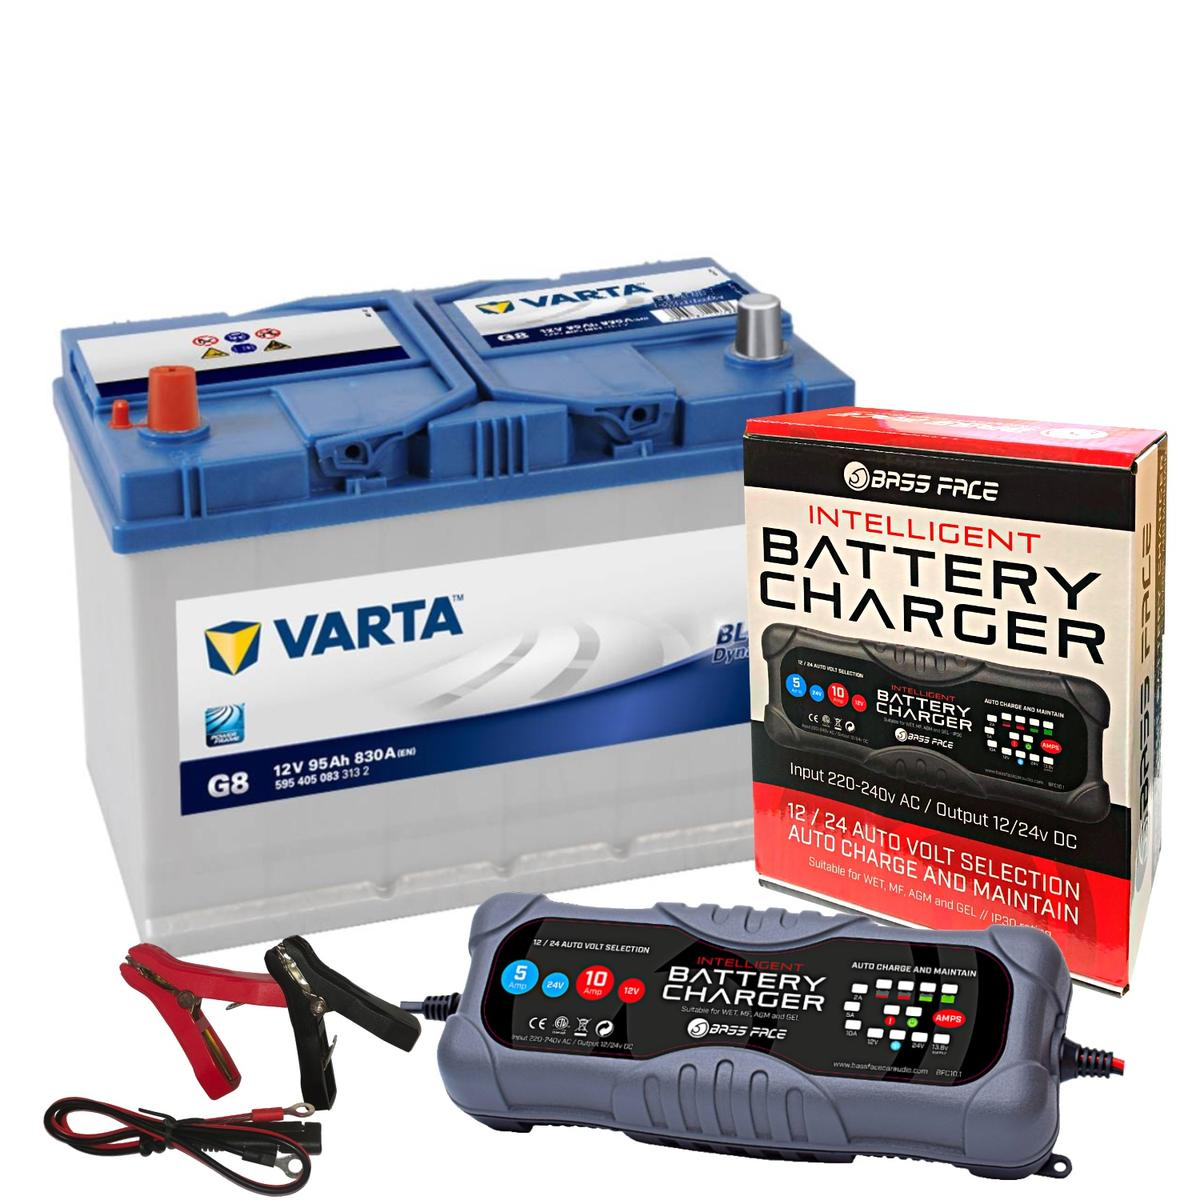 Varta G8 Mazda Car Battery 12v 4 Year 334 / 250H 95Ah 830CCA W/ 10 Amp Charger